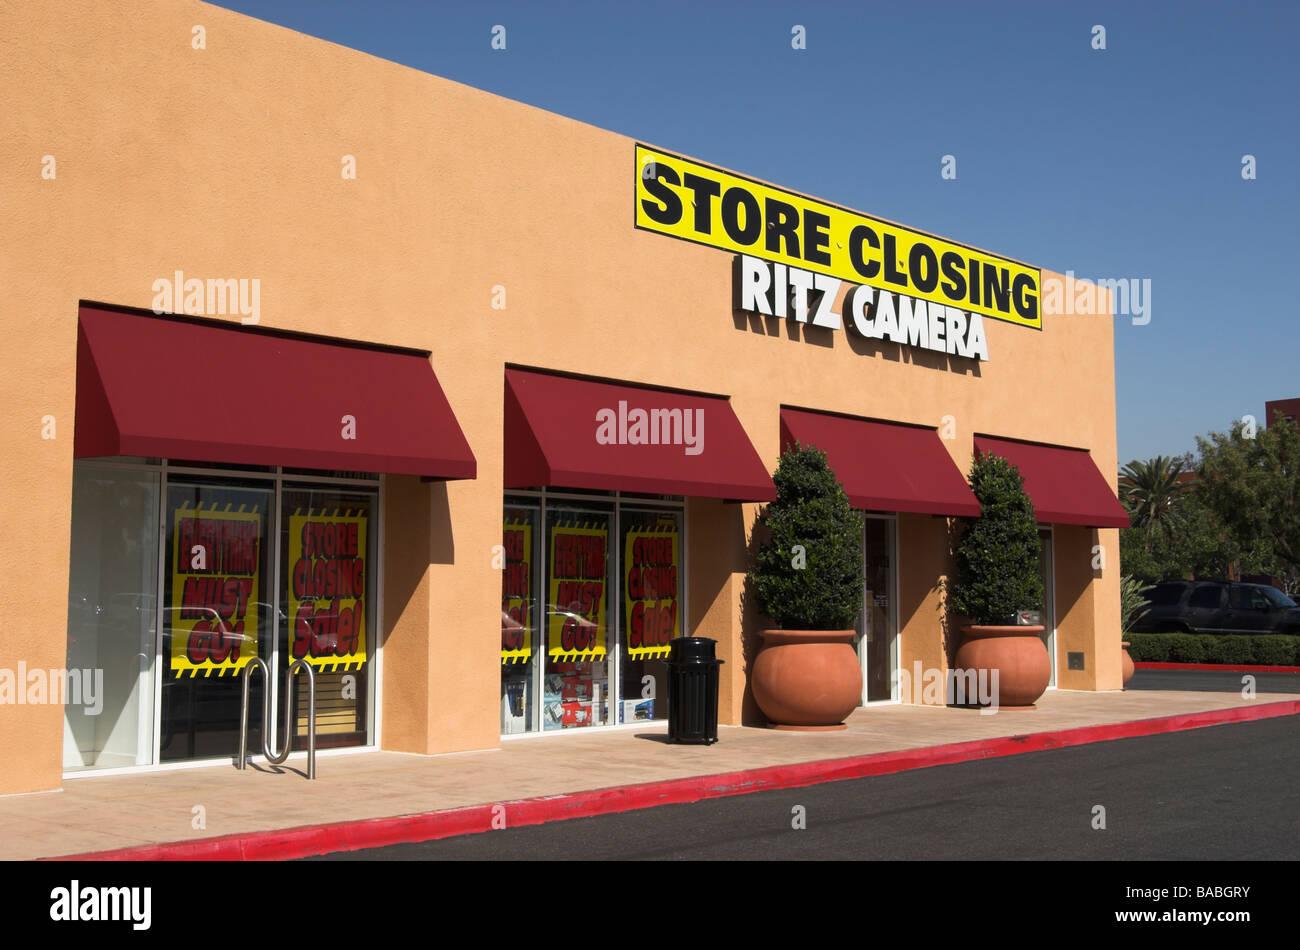 Ritz camera store closing Stock Photo: 23611615 - Alamy